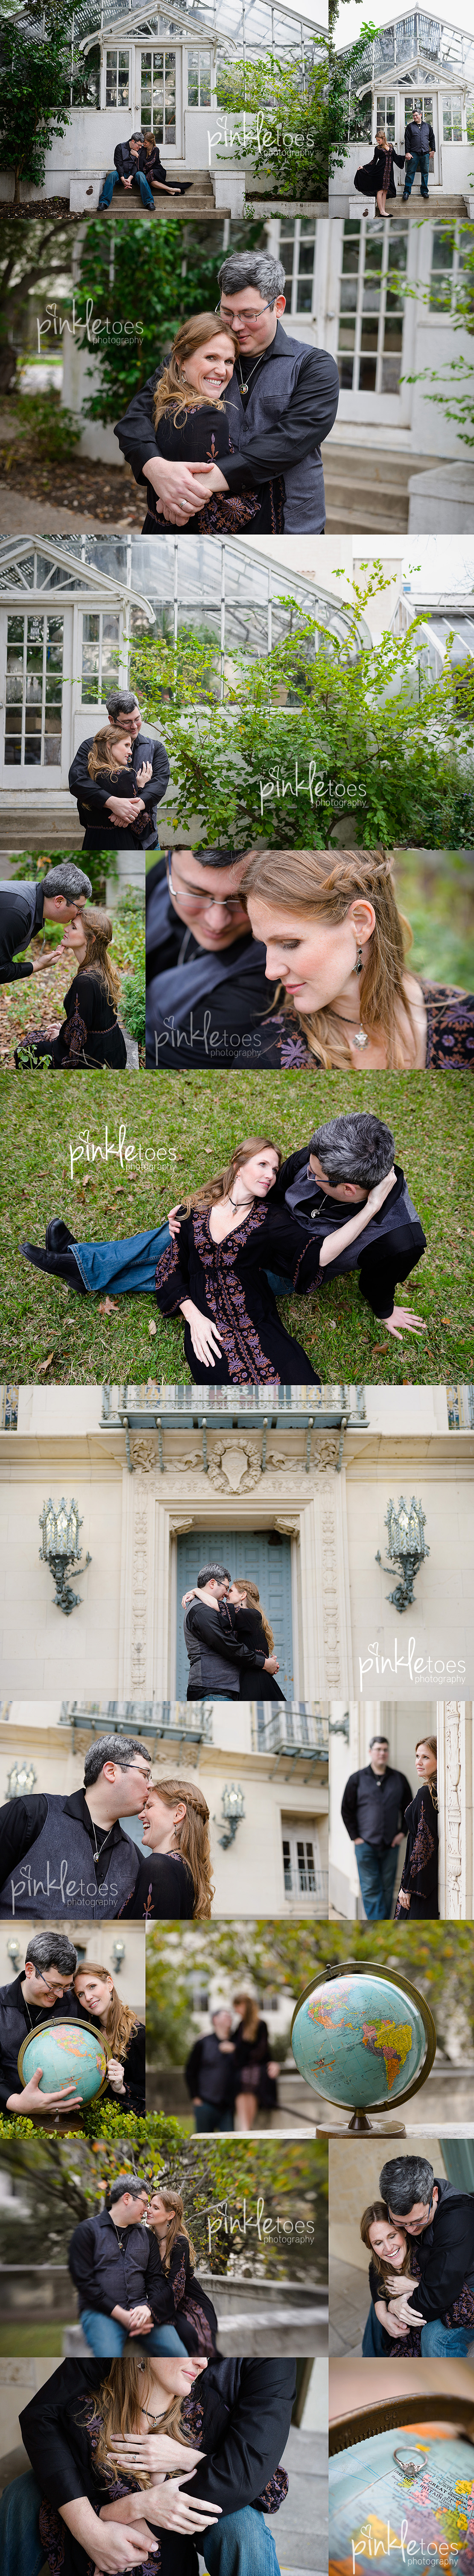 pinkle-toes-austin-engagement-bridal-photographer-university-texas-globe-vintage-couple